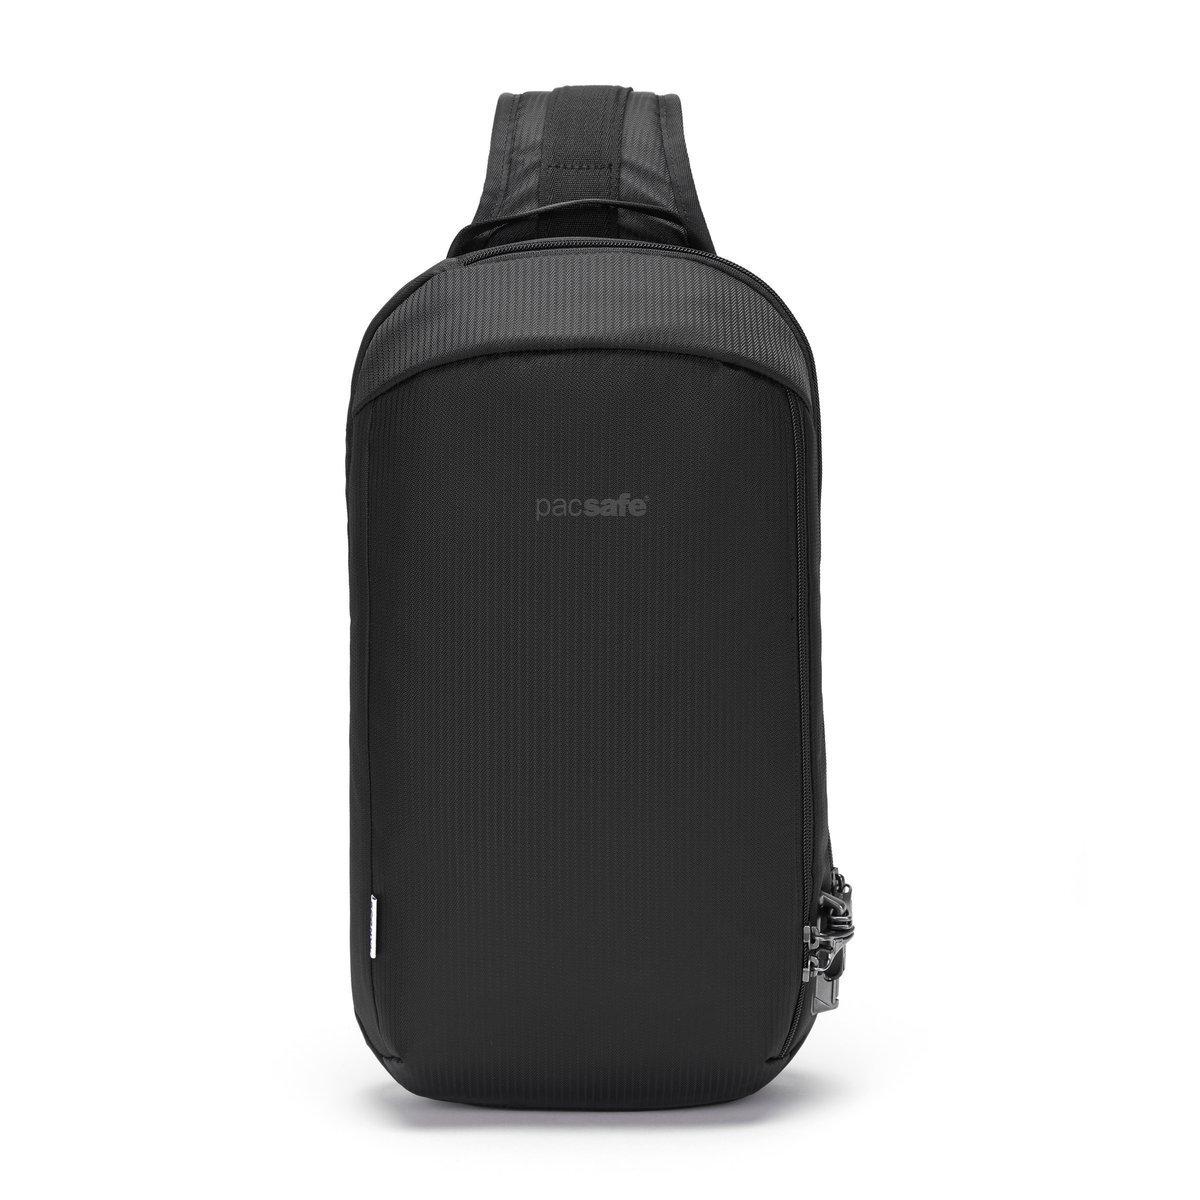 Plecak na jedno ramię Pacsafe Vibe 325 - Econyl Black